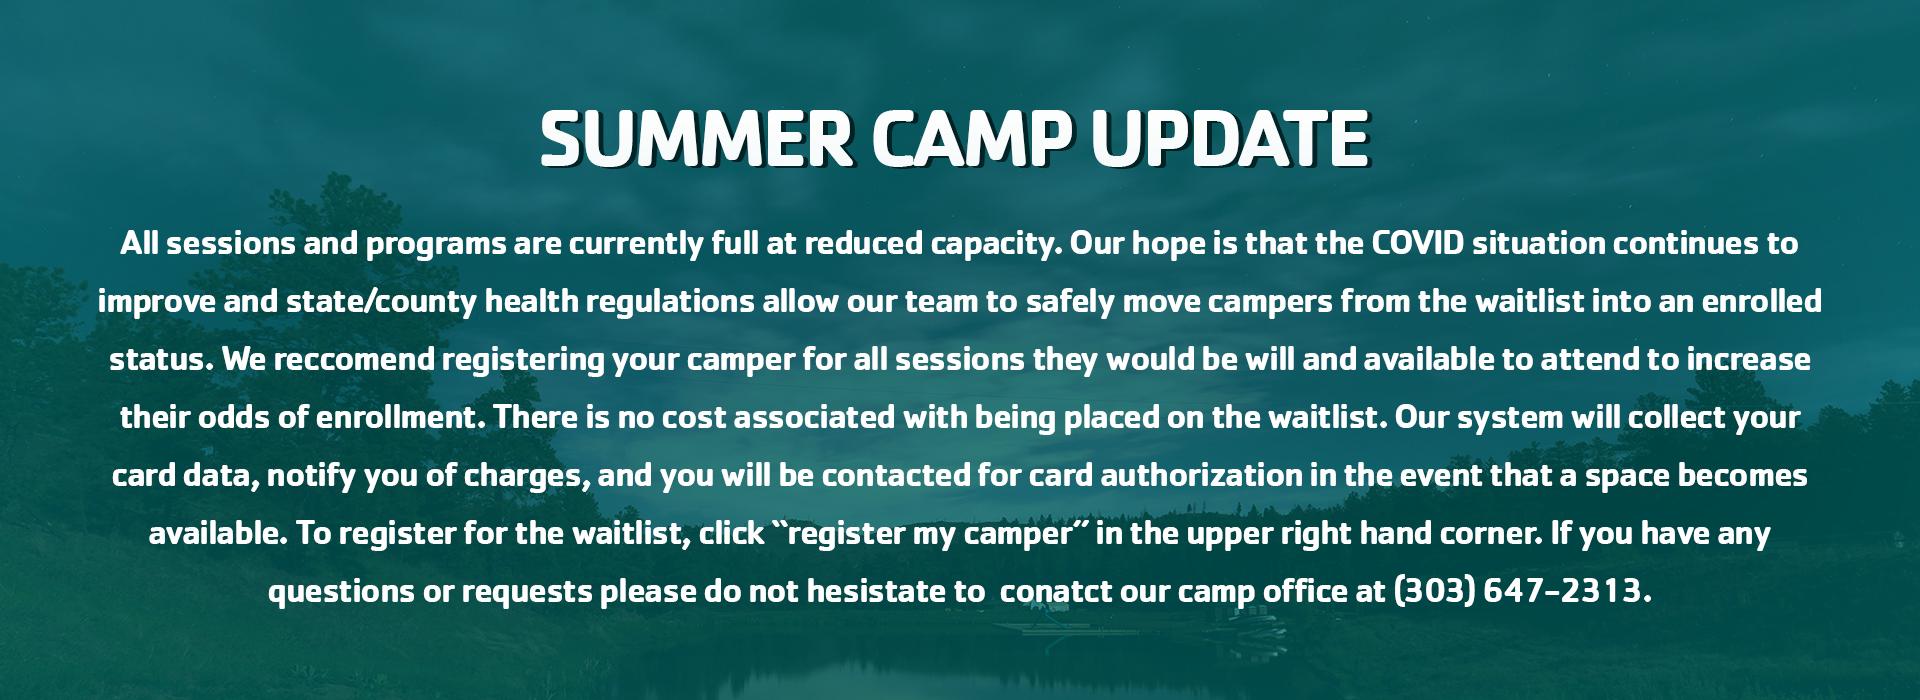 SummerCampNEW